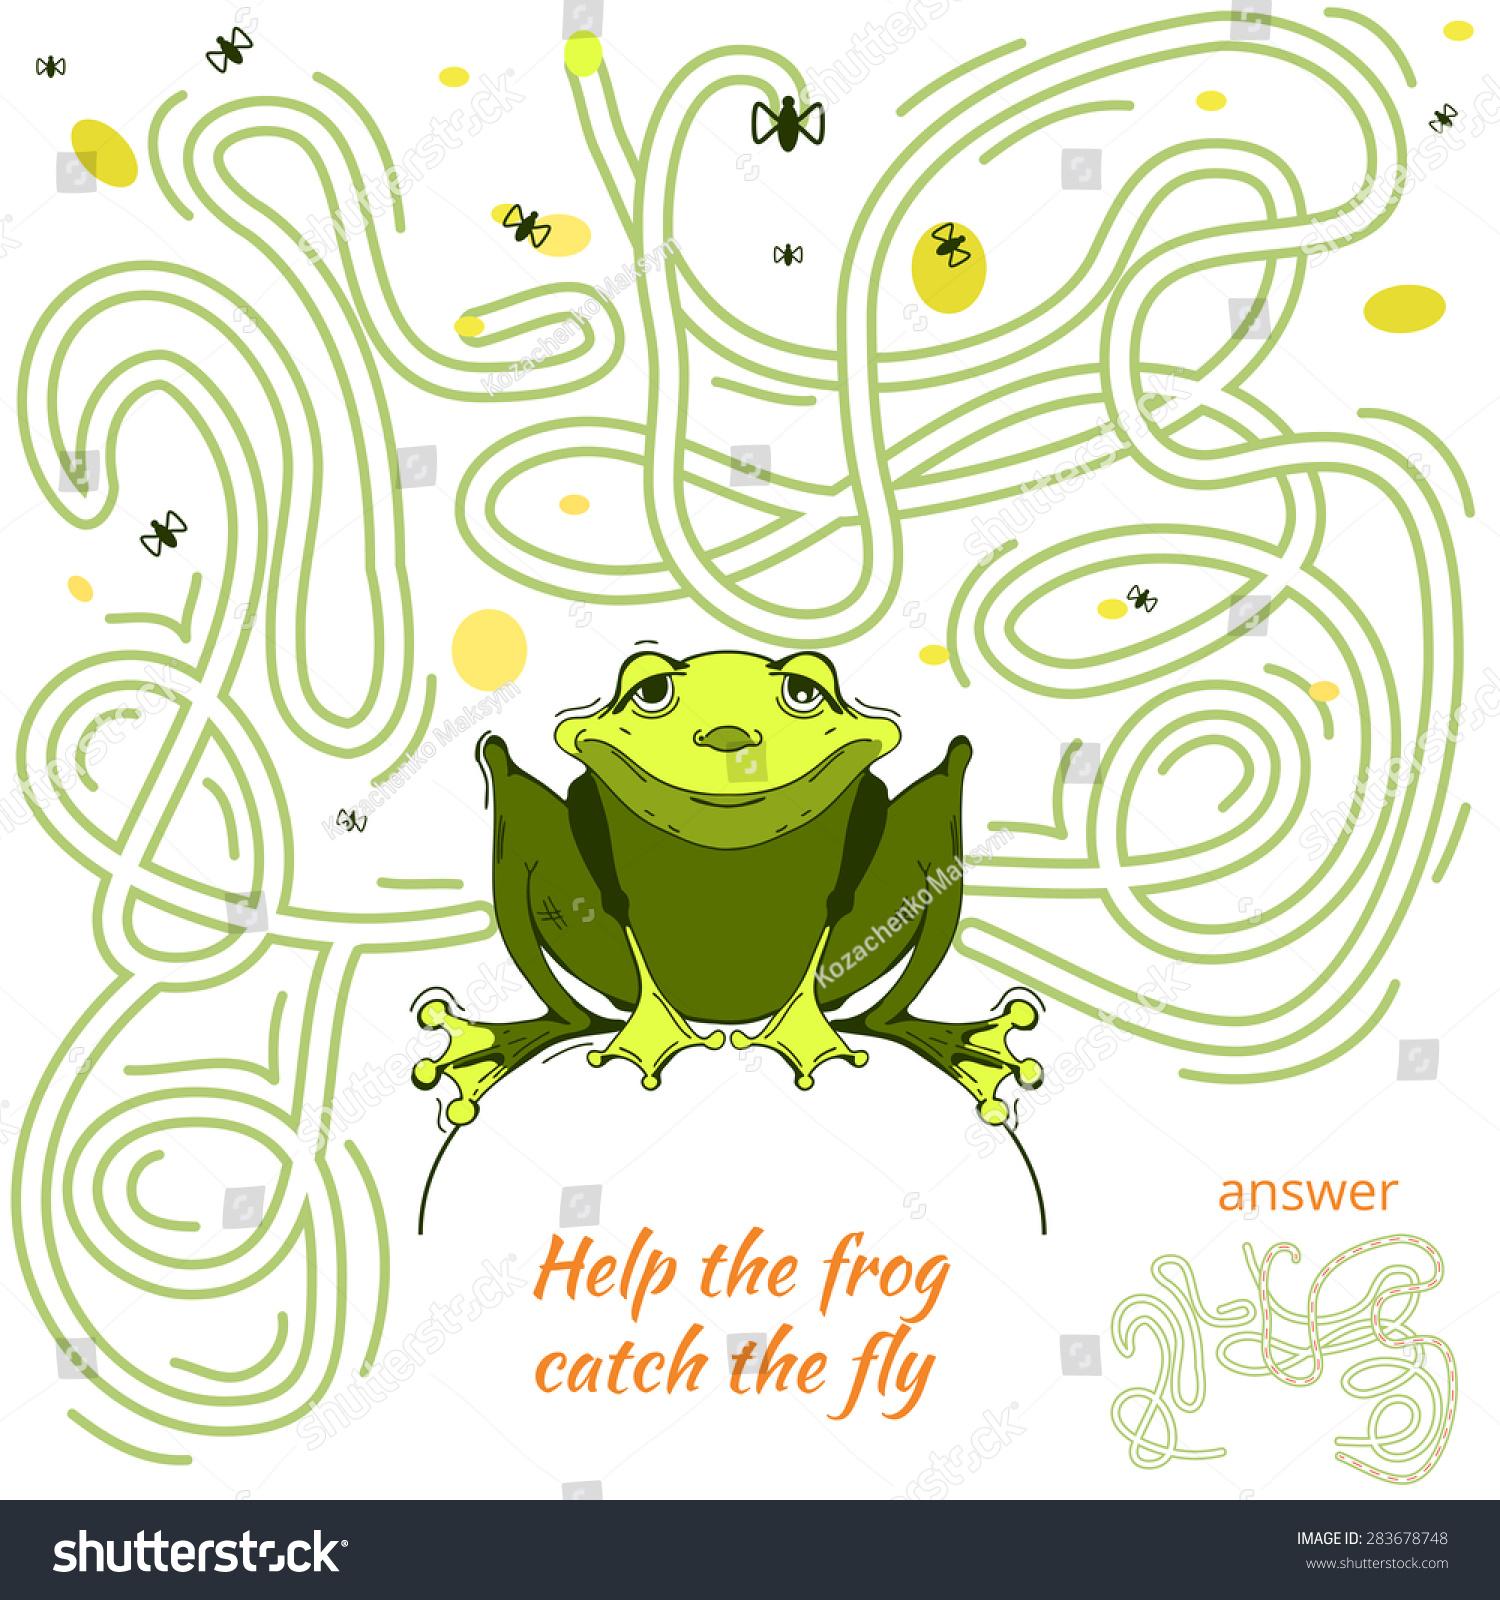 Funny Maze Game Kids Maze Labyrinth Stock Vector (2018) 283678748 ...